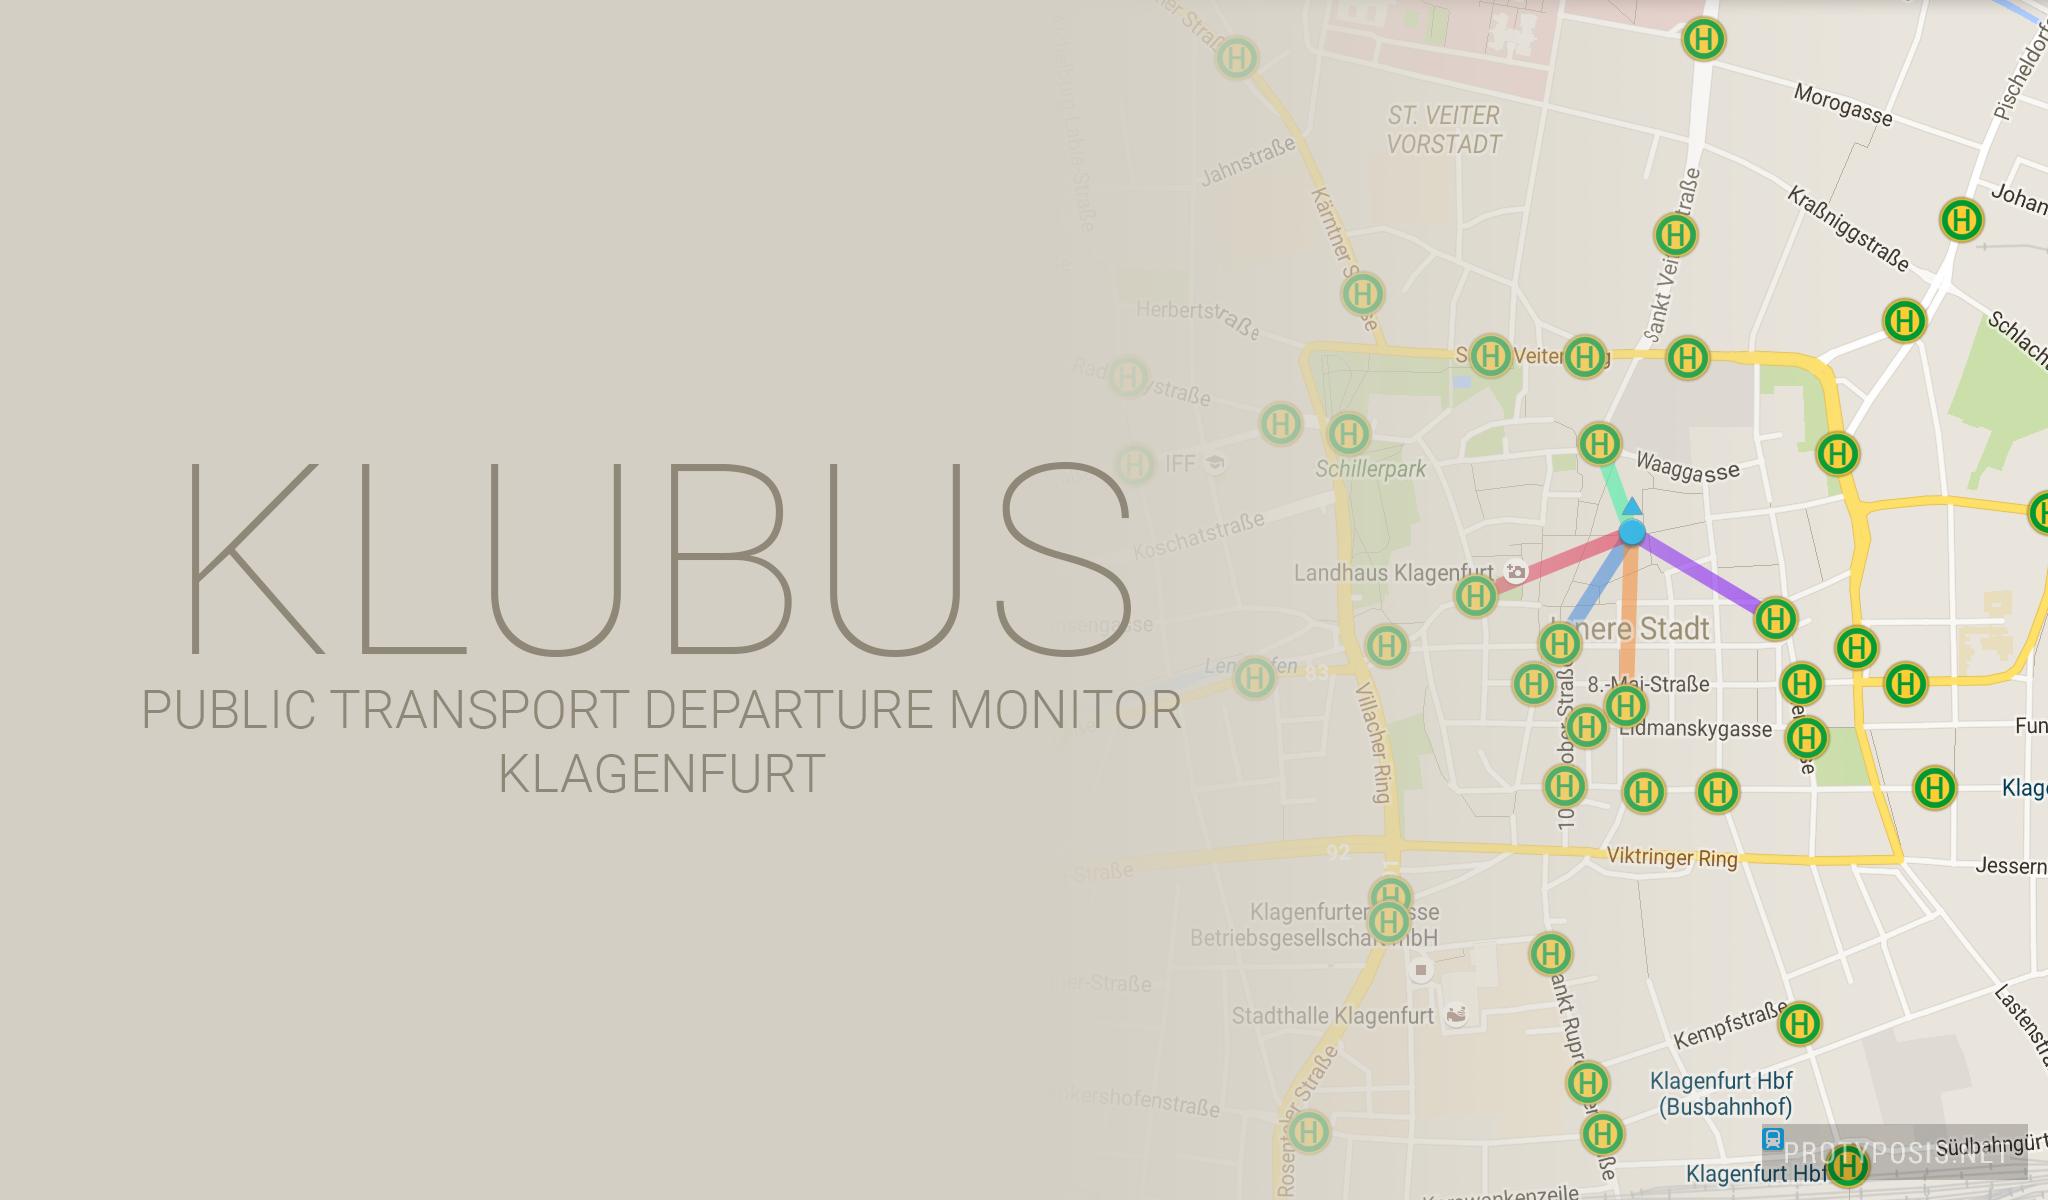 klu5/src/assets/imgs/klubus.png